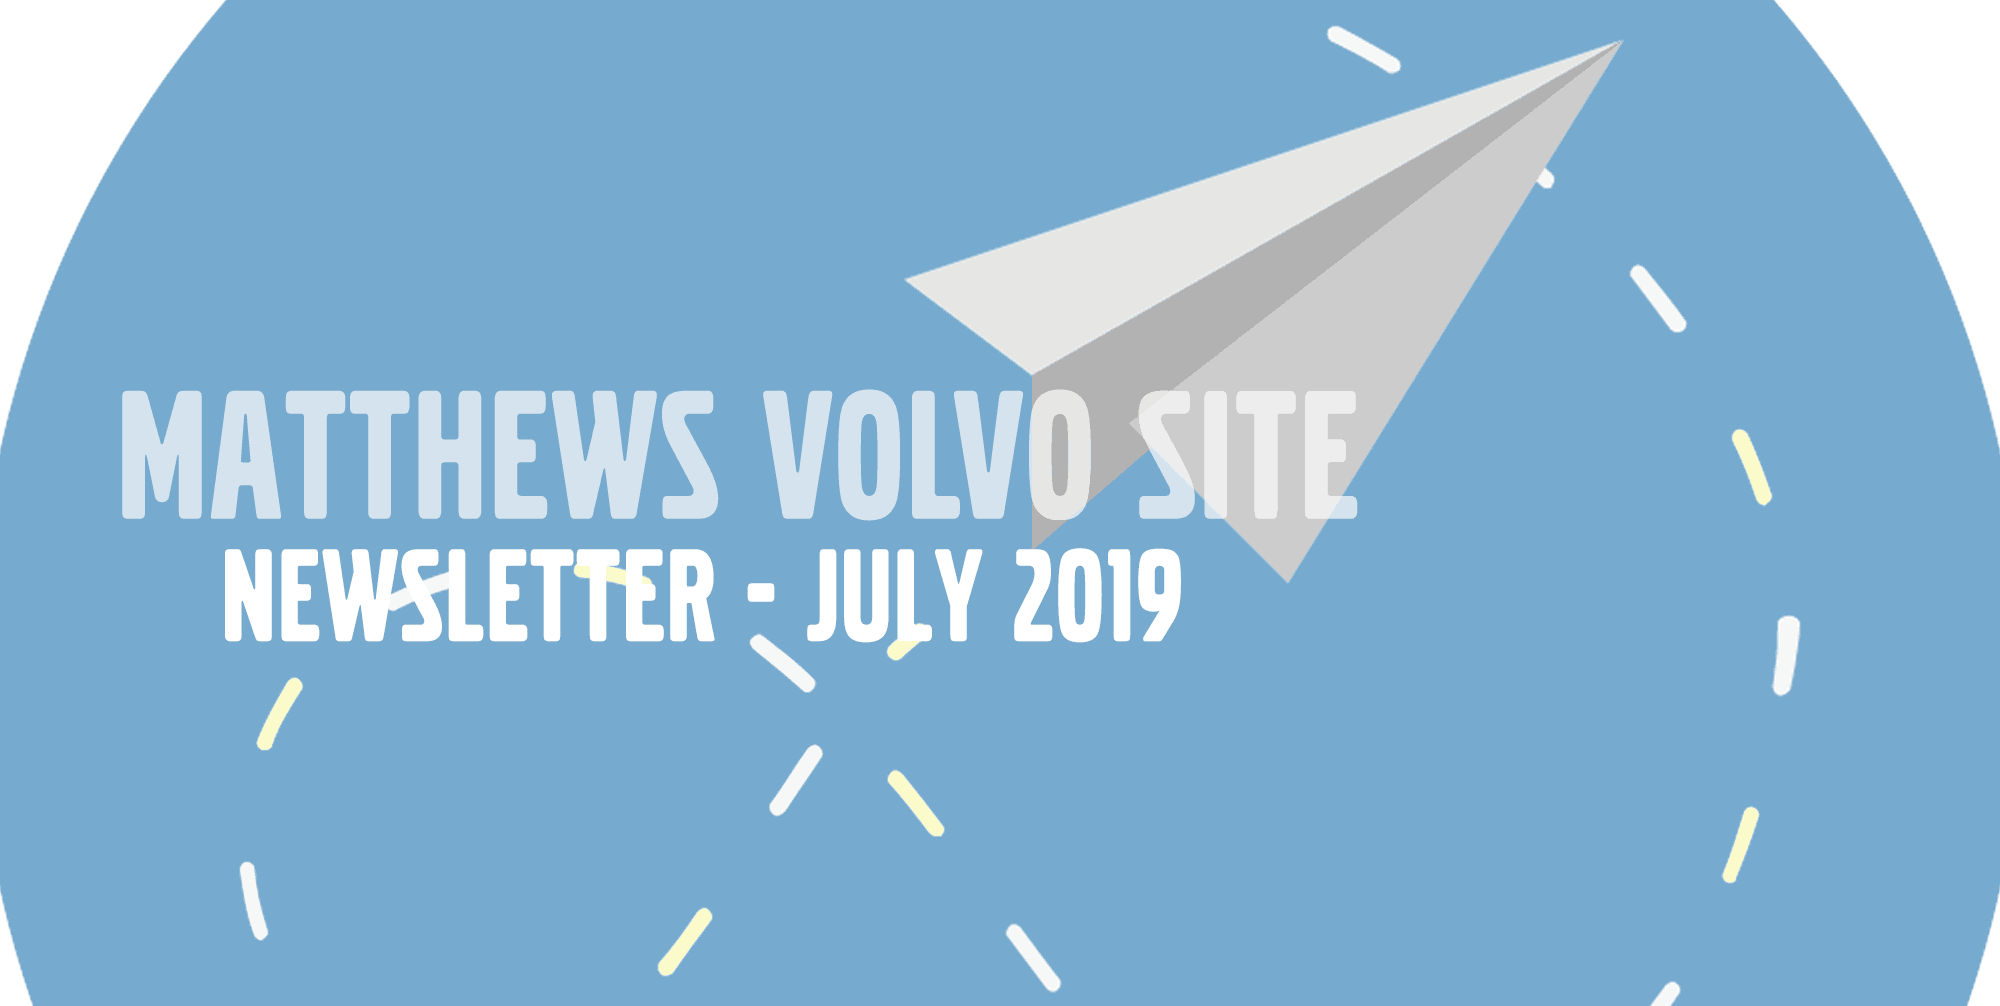 Mvs Newsletter July 2019 1920 -